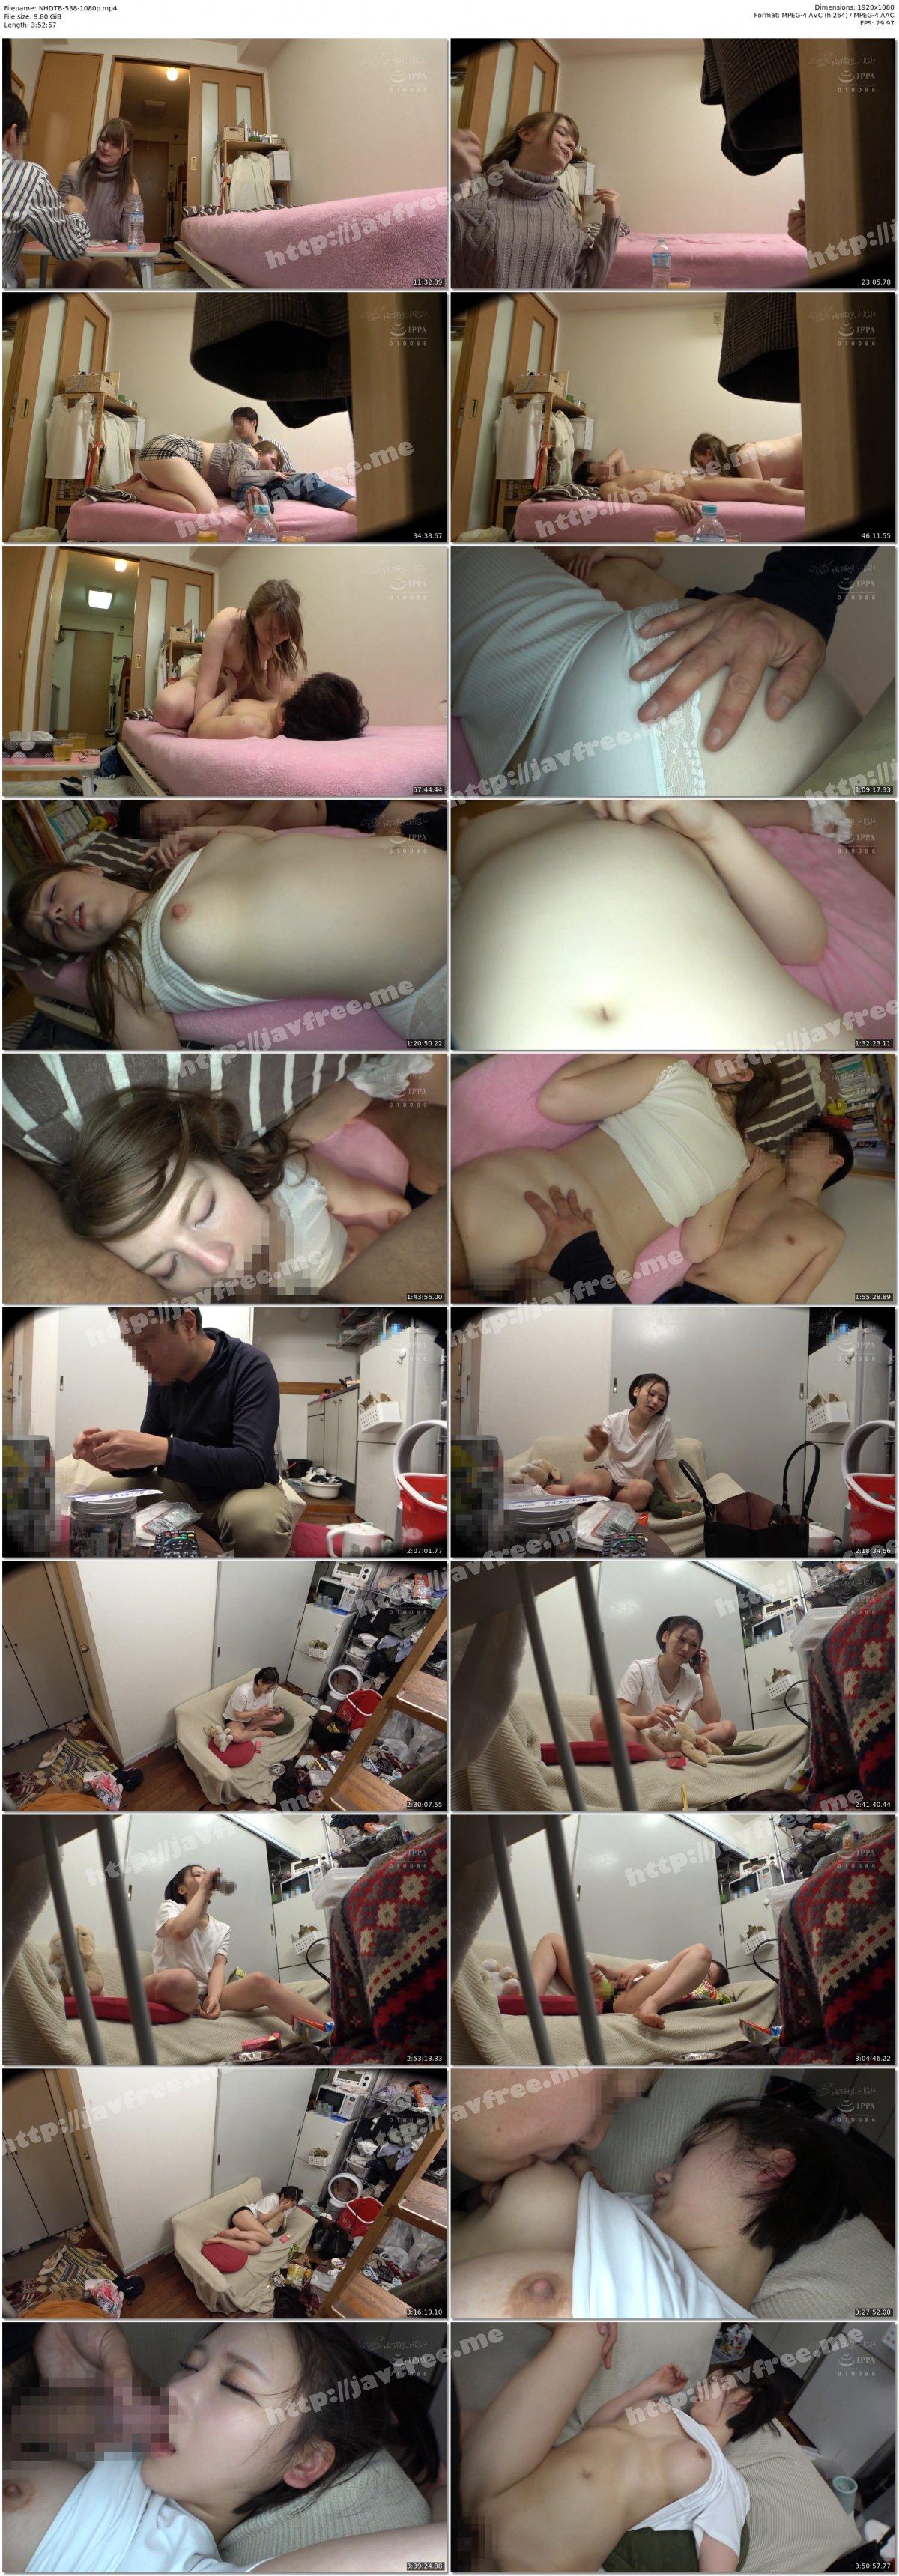 [HD][NHDTB-538] 独り暮らしの自宅に潜む侵入者に眠剤を盛られ犯りたい放題ハメられた巨乳女 - image NHDTB-538-1080p on https://javfree.me